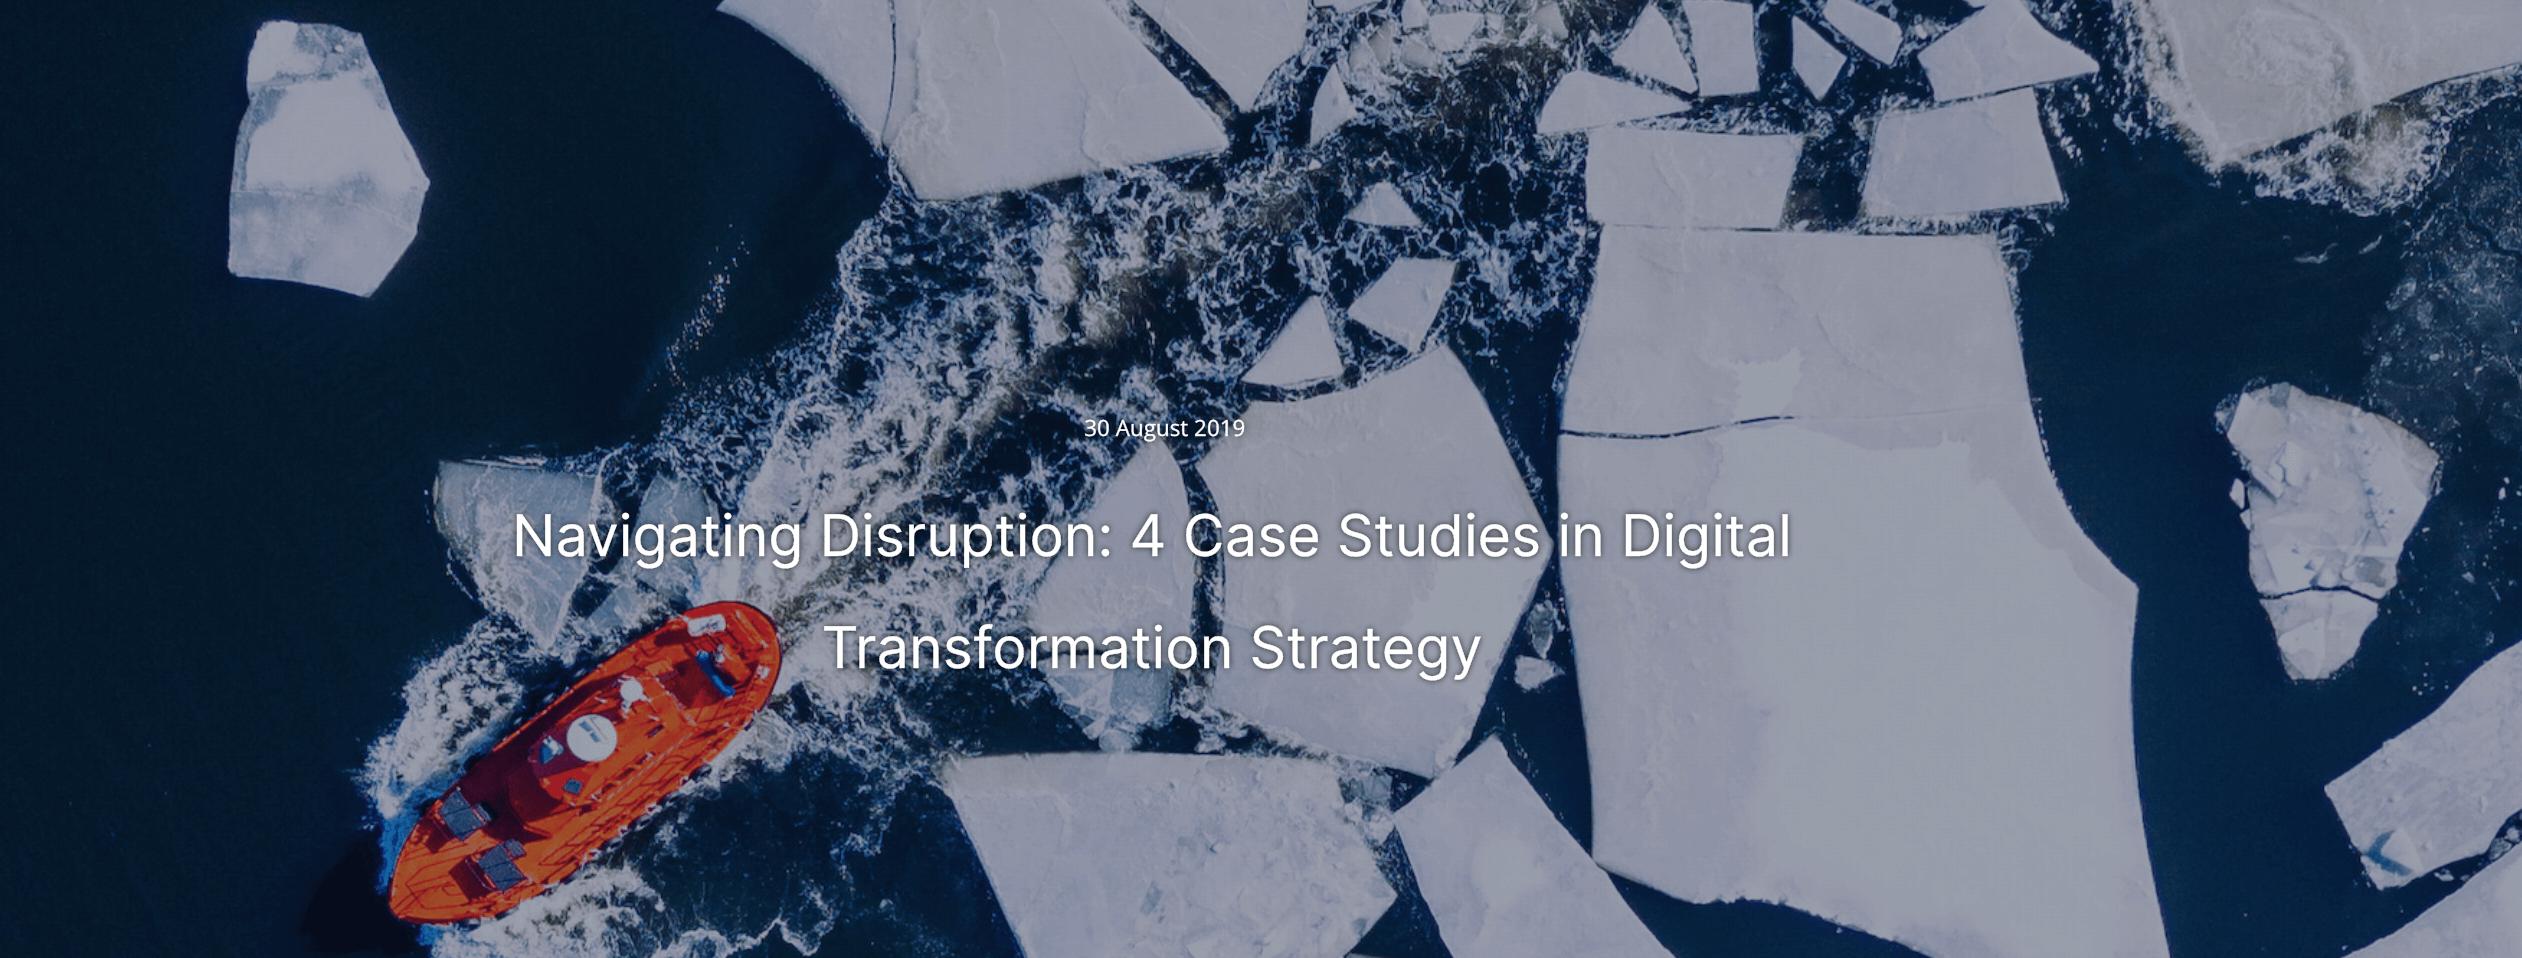 digital-transformation-case-studies